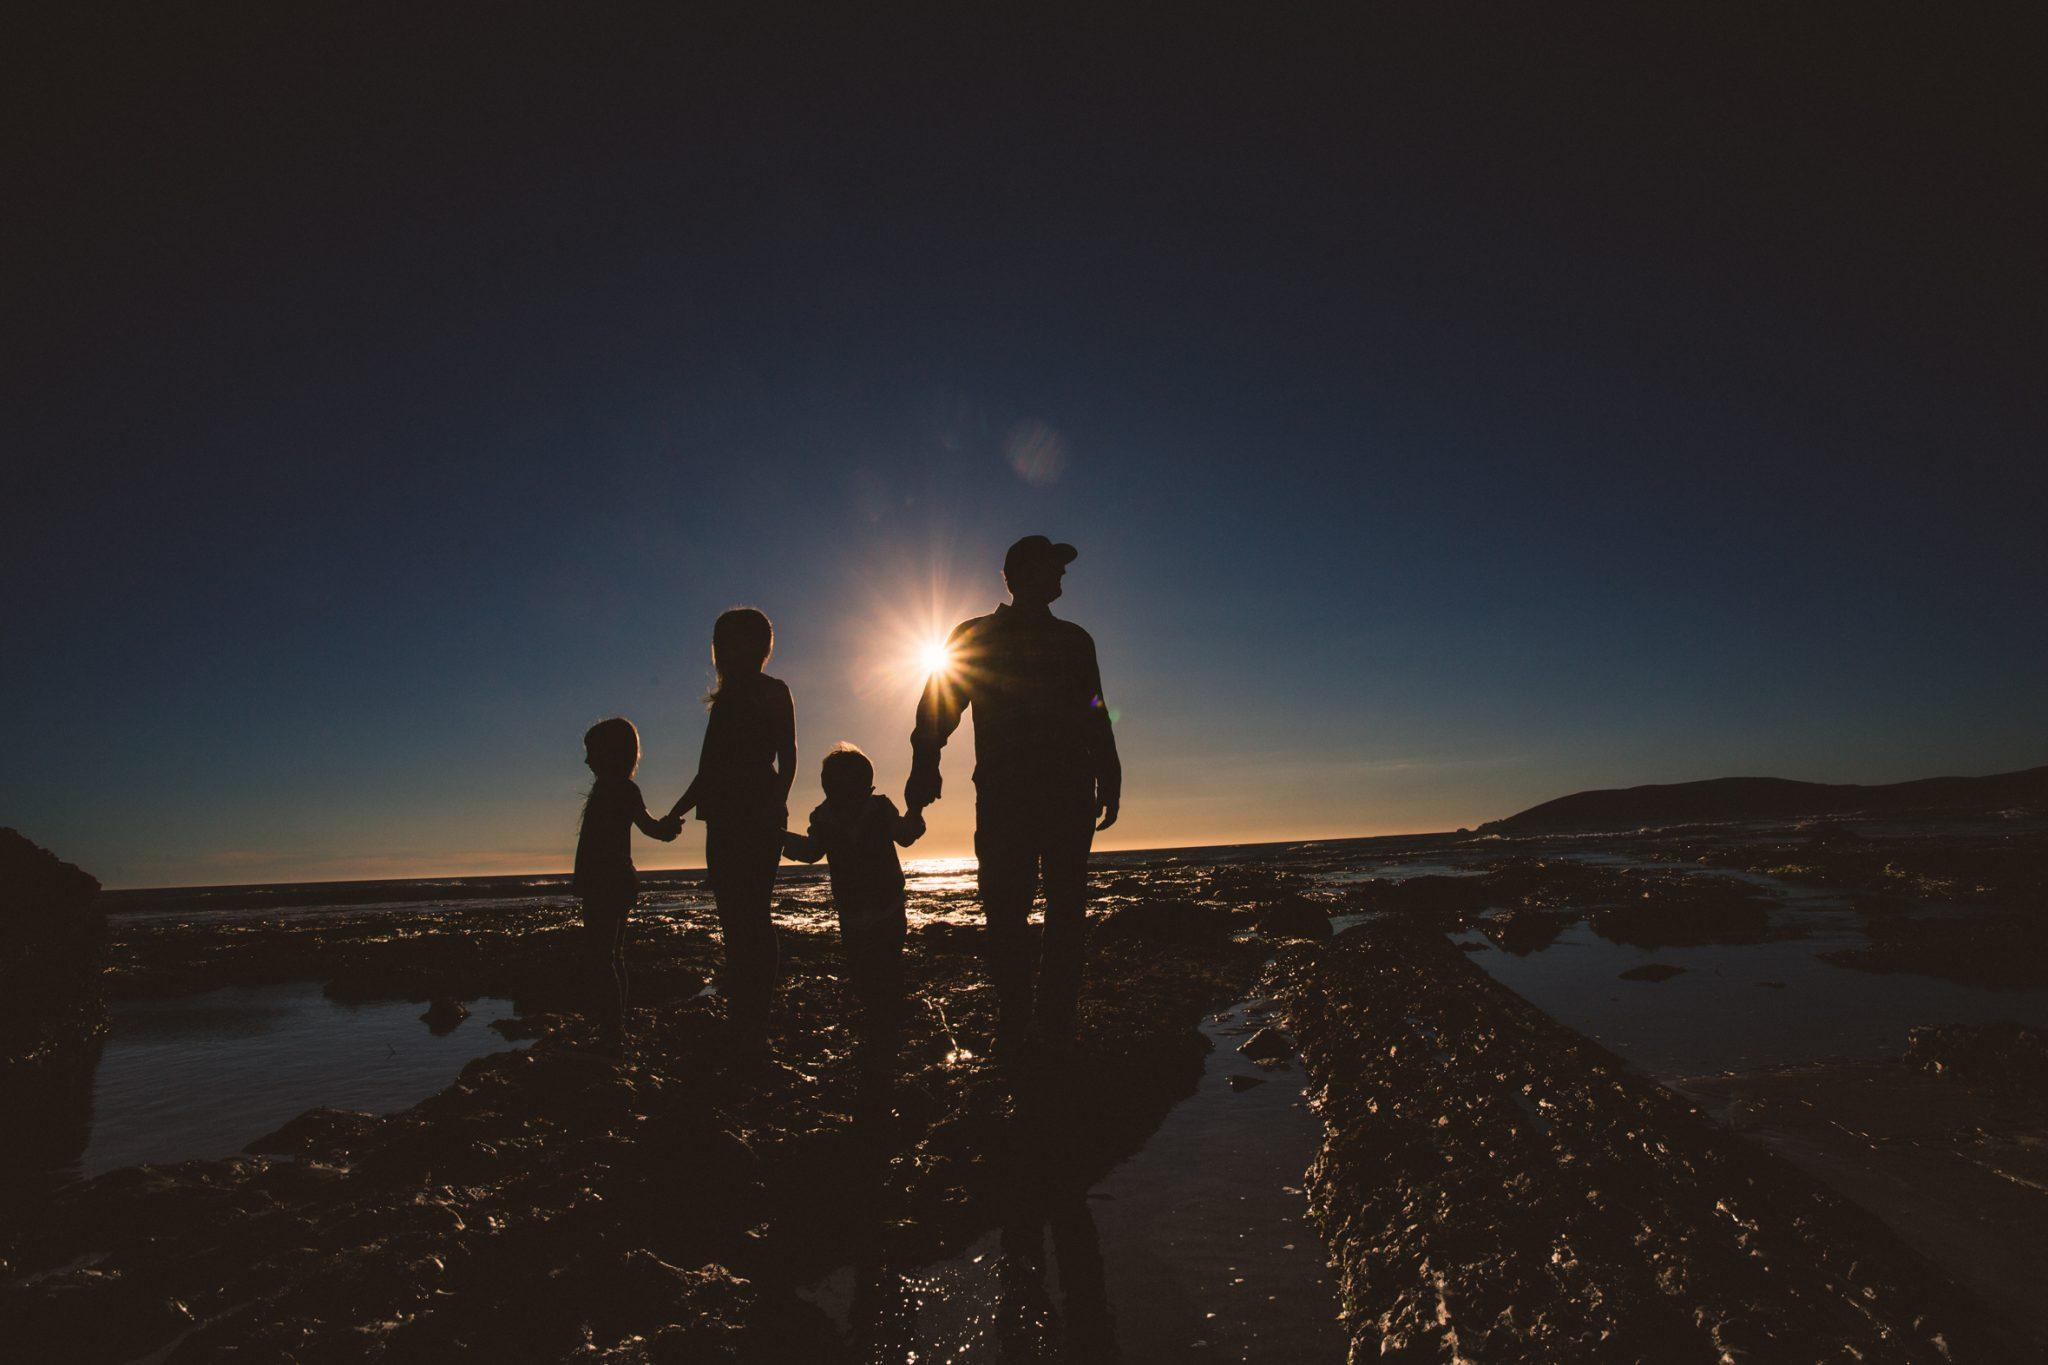 epic family photo